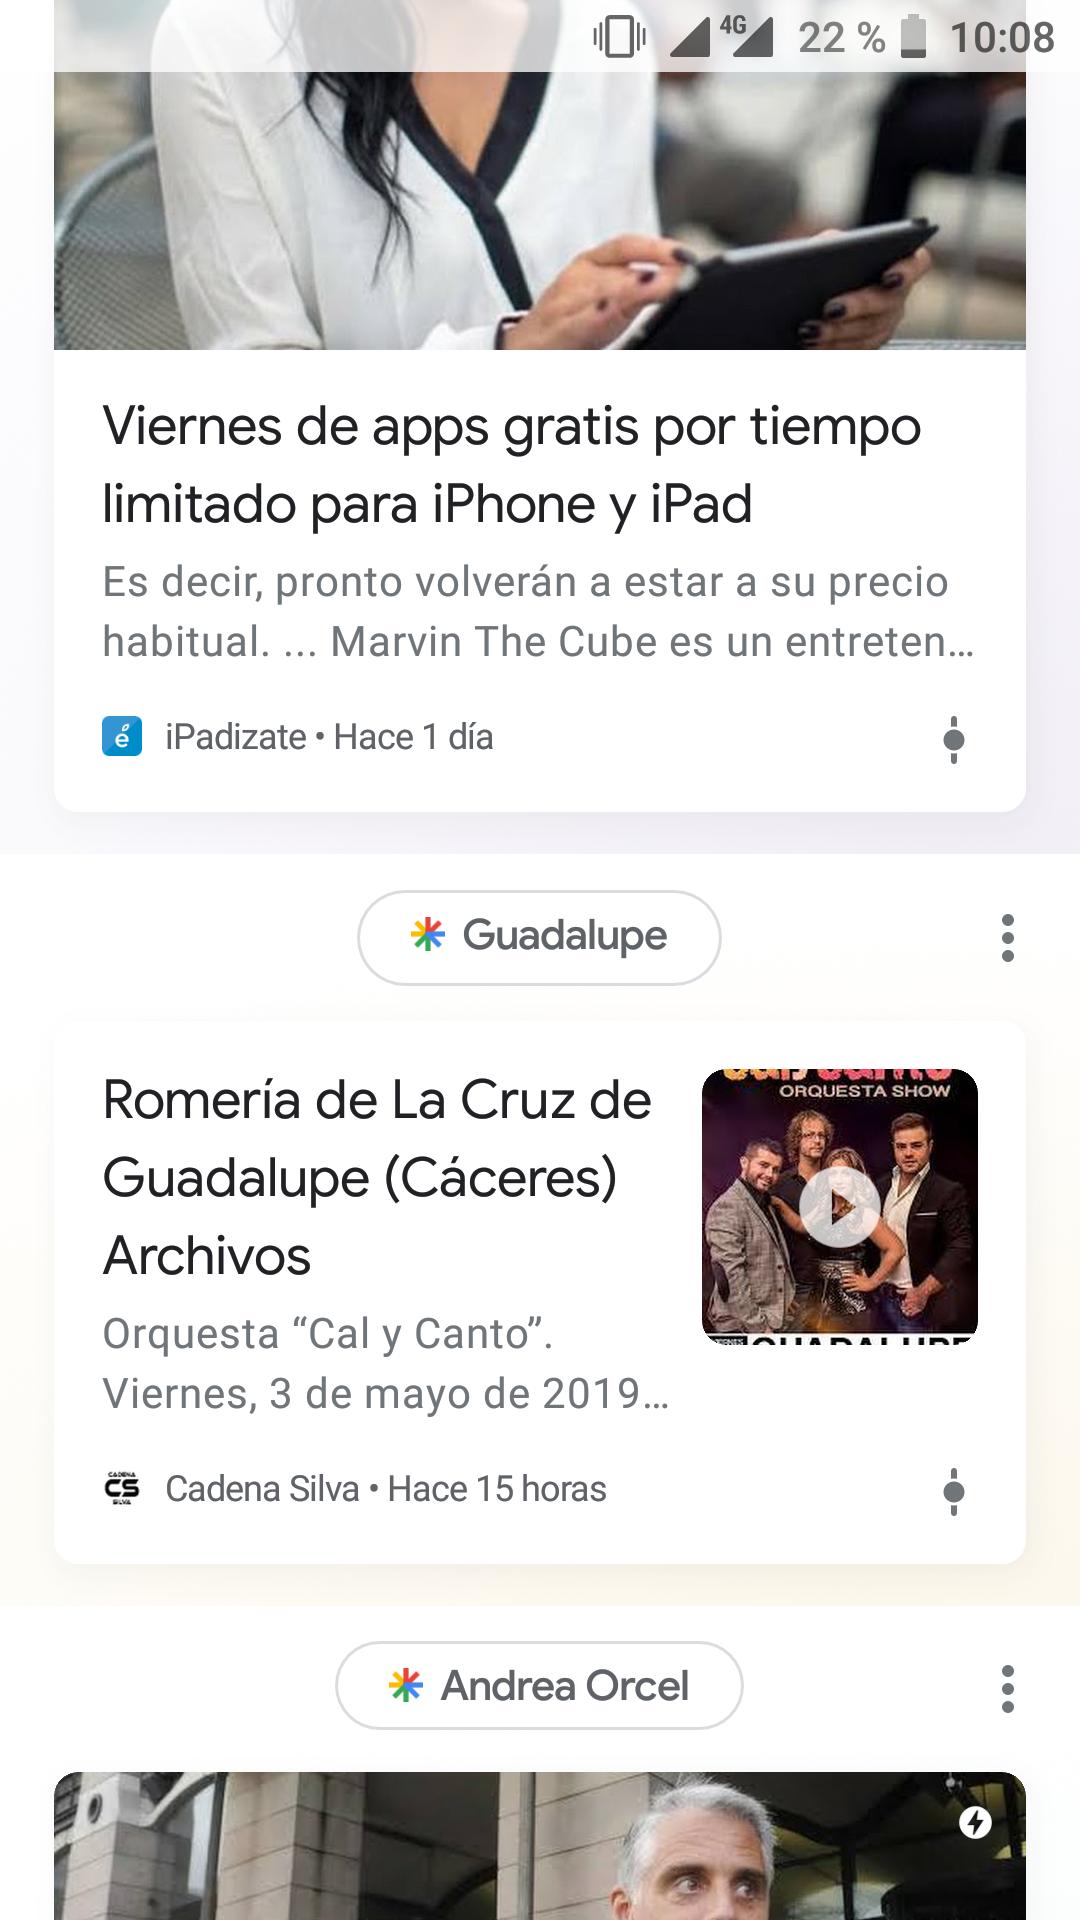 Cadena Silva comienza a aparecer en Google Discover